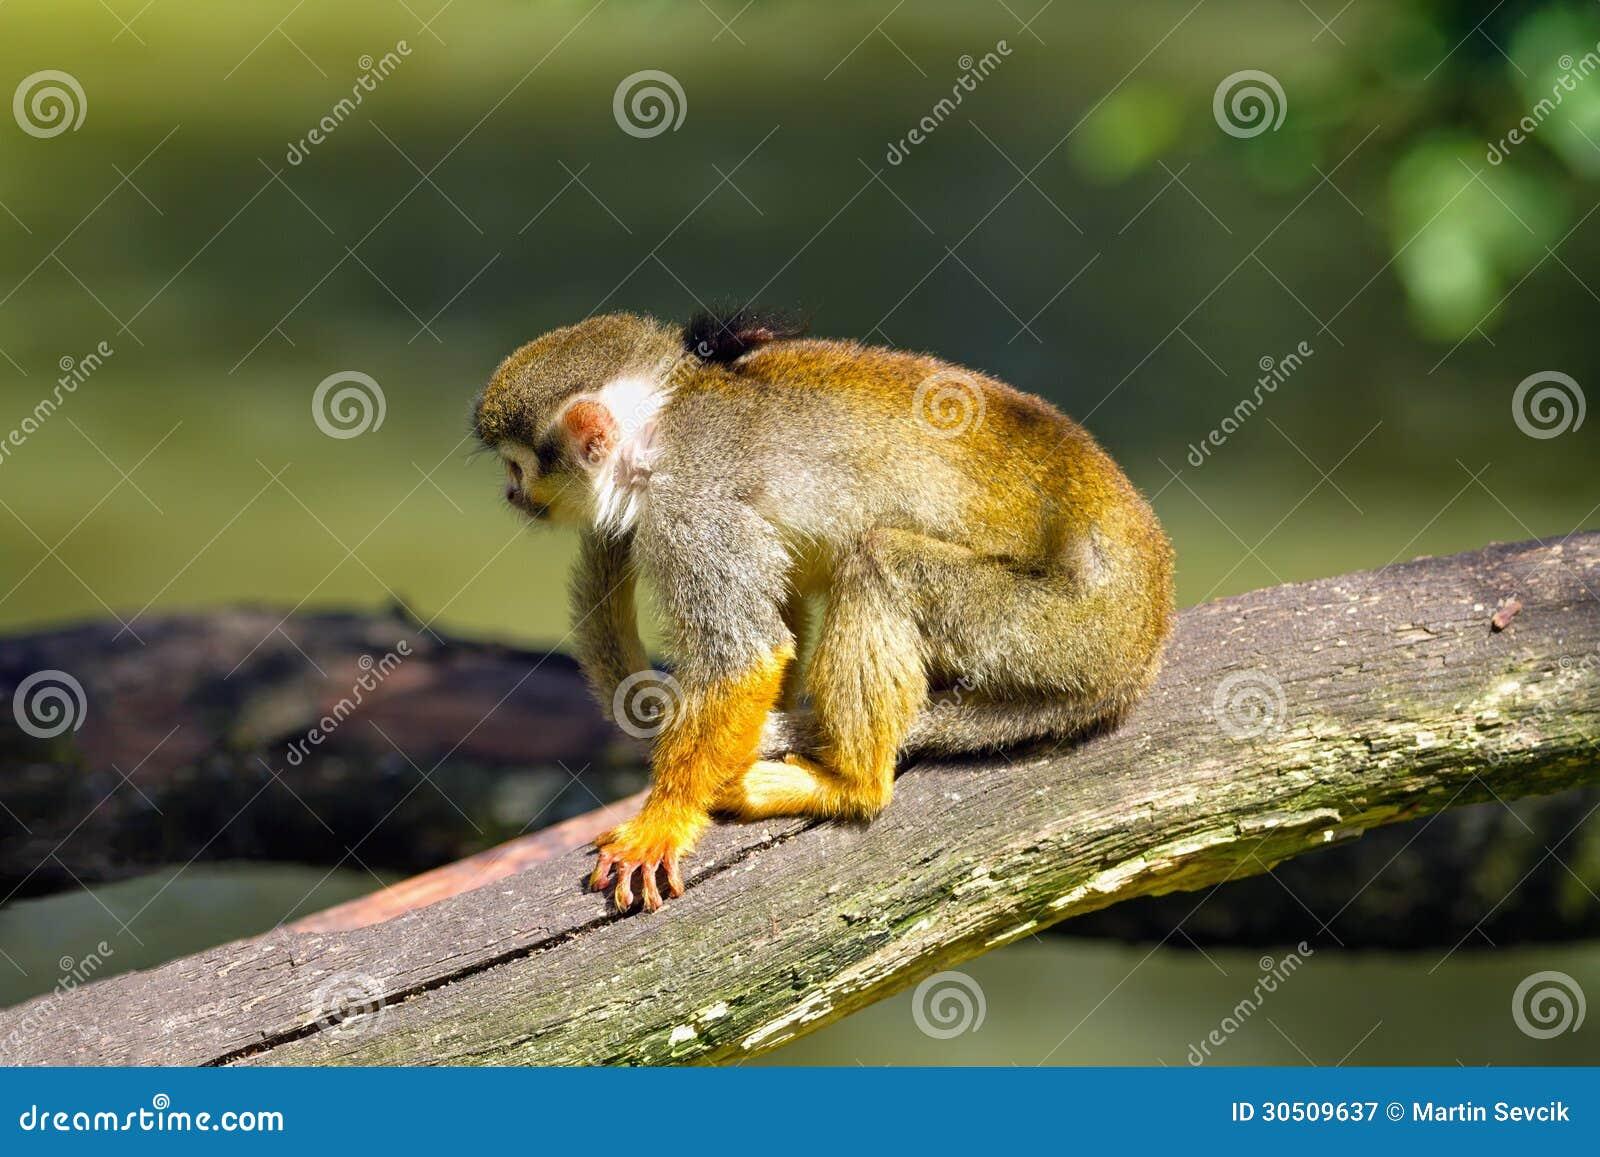 Squirrel monkeys in trees - photo#30